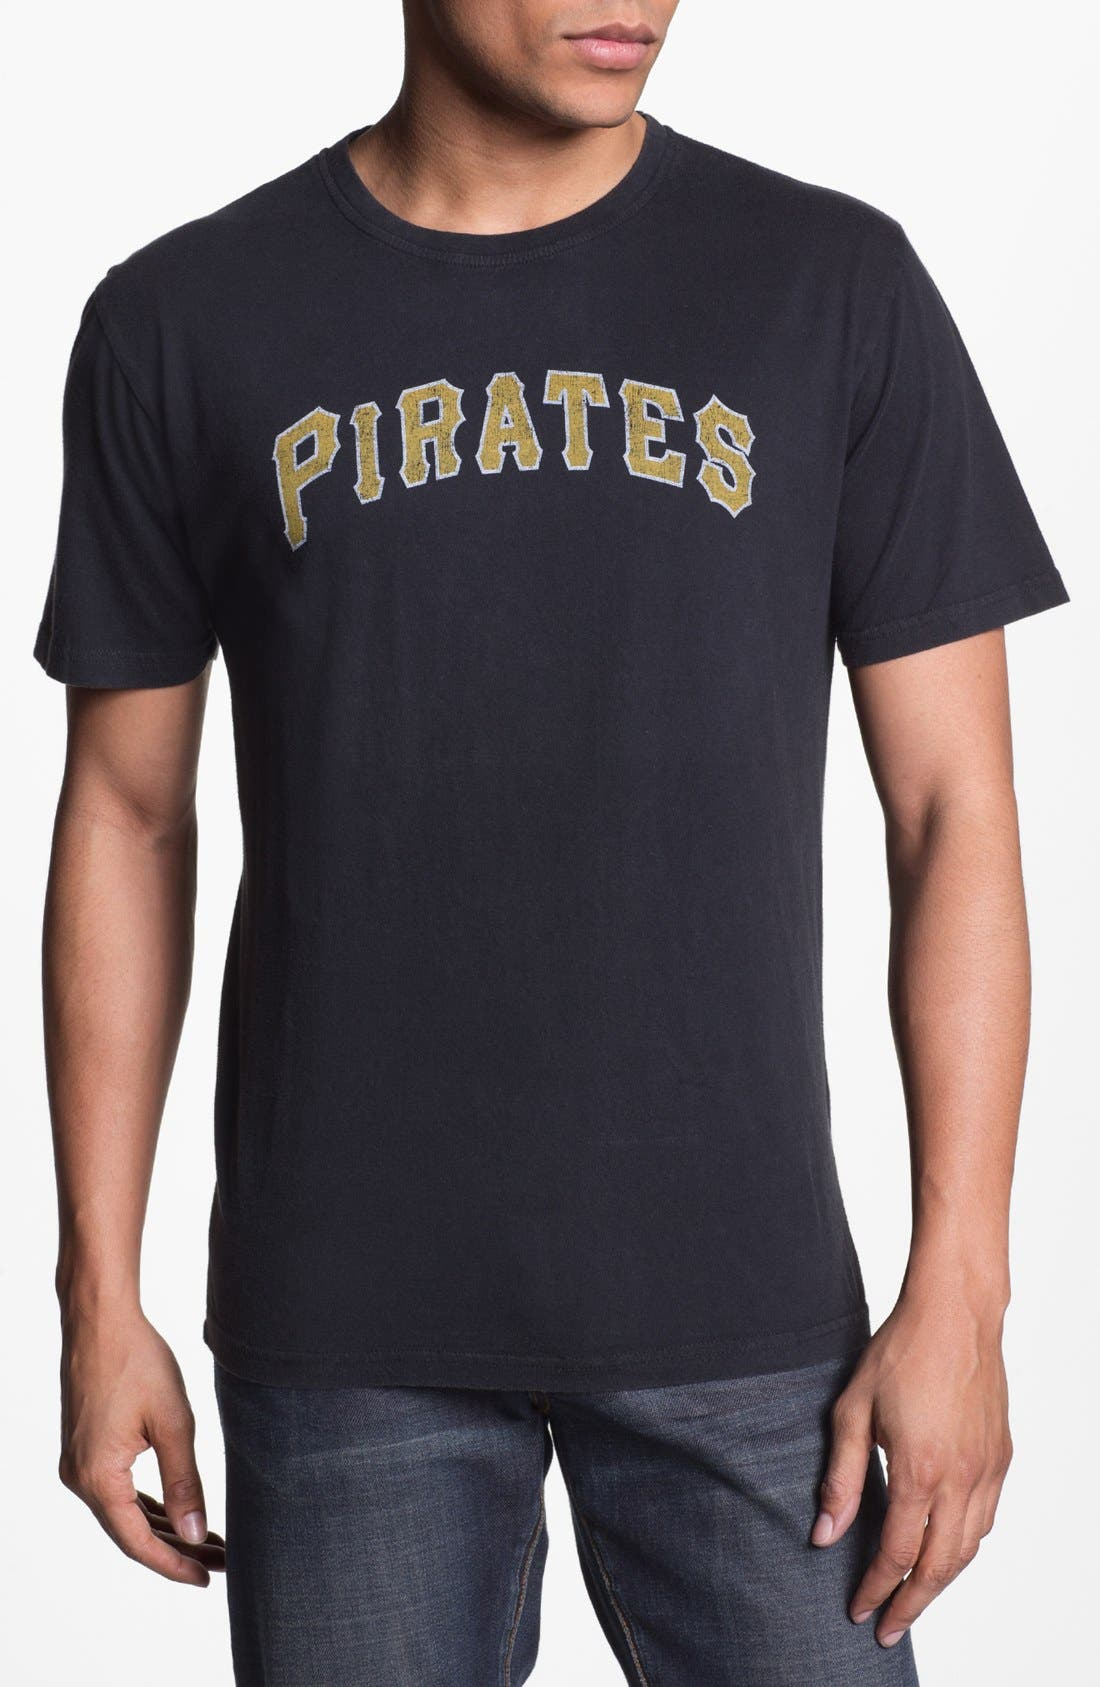 Alternate Image 1 Selected - Red Jacket 'Pirates - Brass Tack' T-Shirt